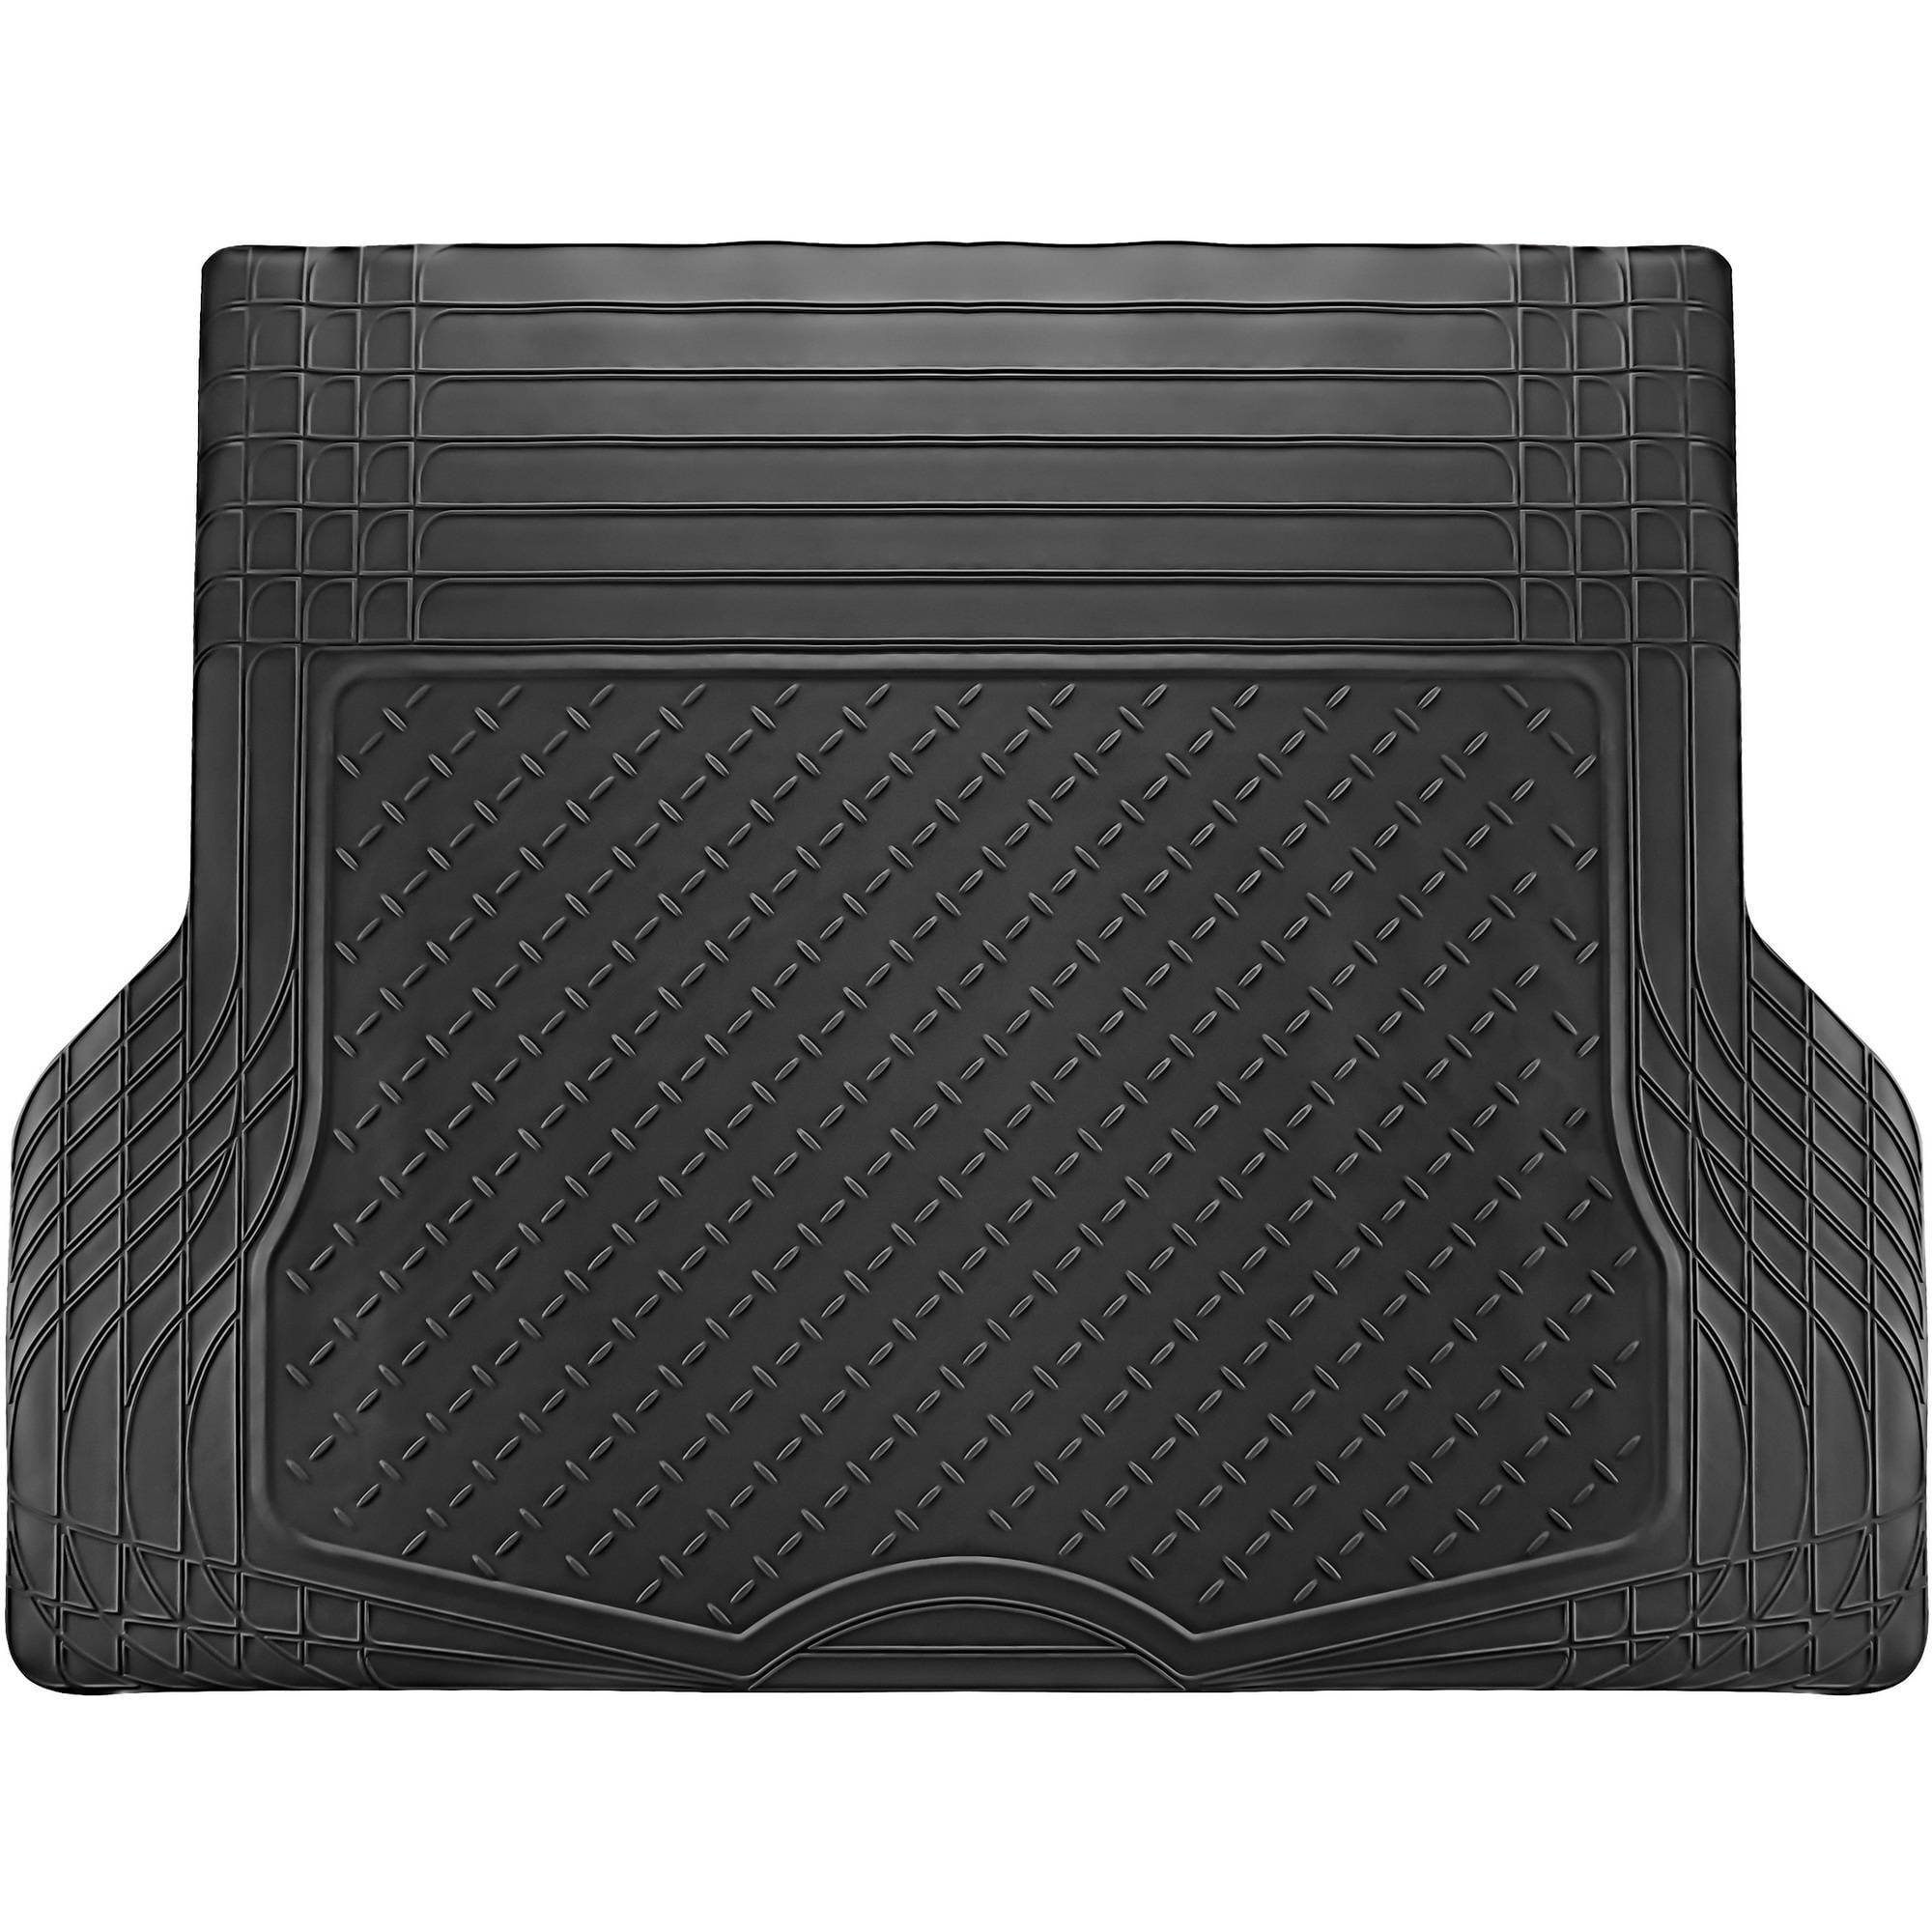 MotorTrend Premium Odorless Heavy Duty Trimmable High Grade Rubber Cargo Floor Mat 43.2 x 53.7 Black